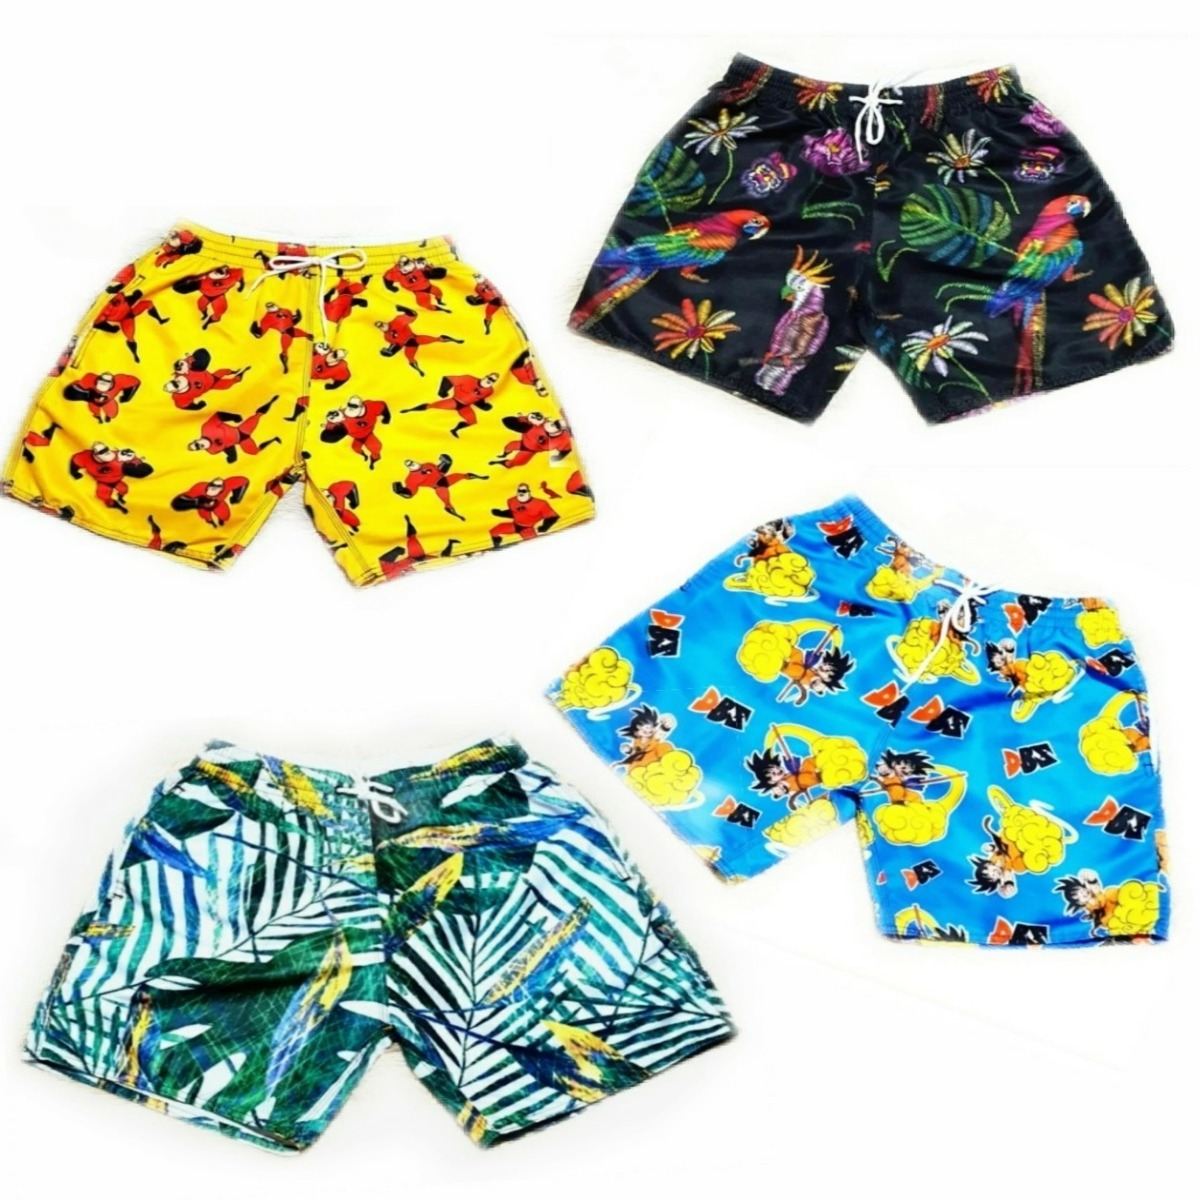 Kit 6 Shorts Mauricinho Bermudas Moda Praia Estilo Neymar